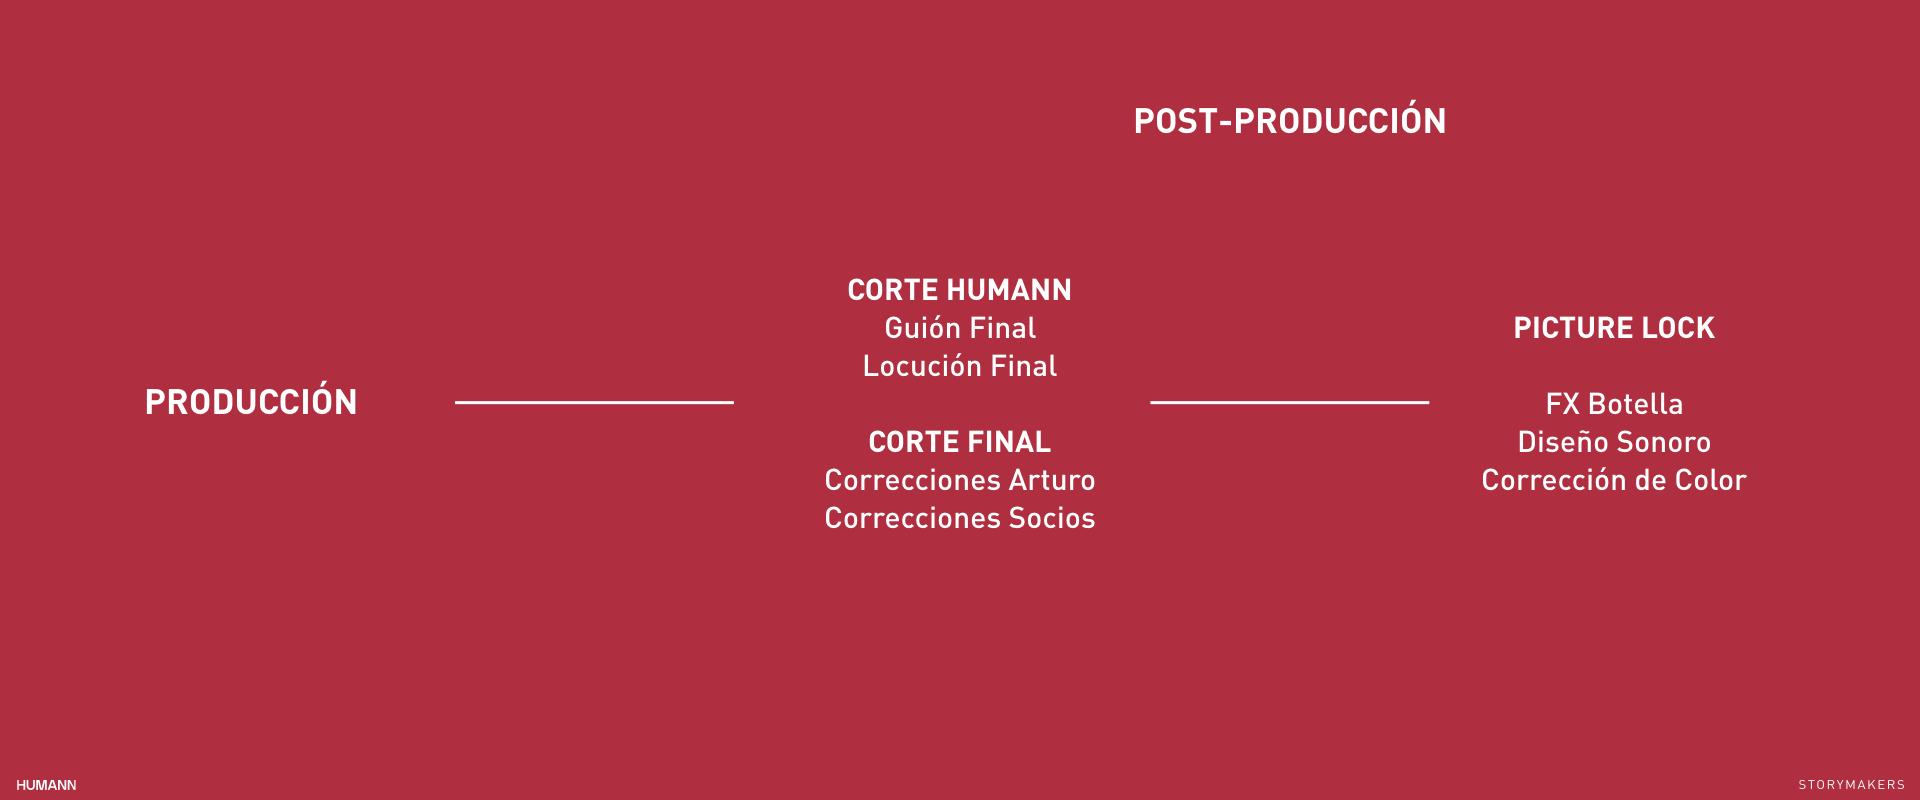 LOCO HUMANN Primer corte.004.jpeg